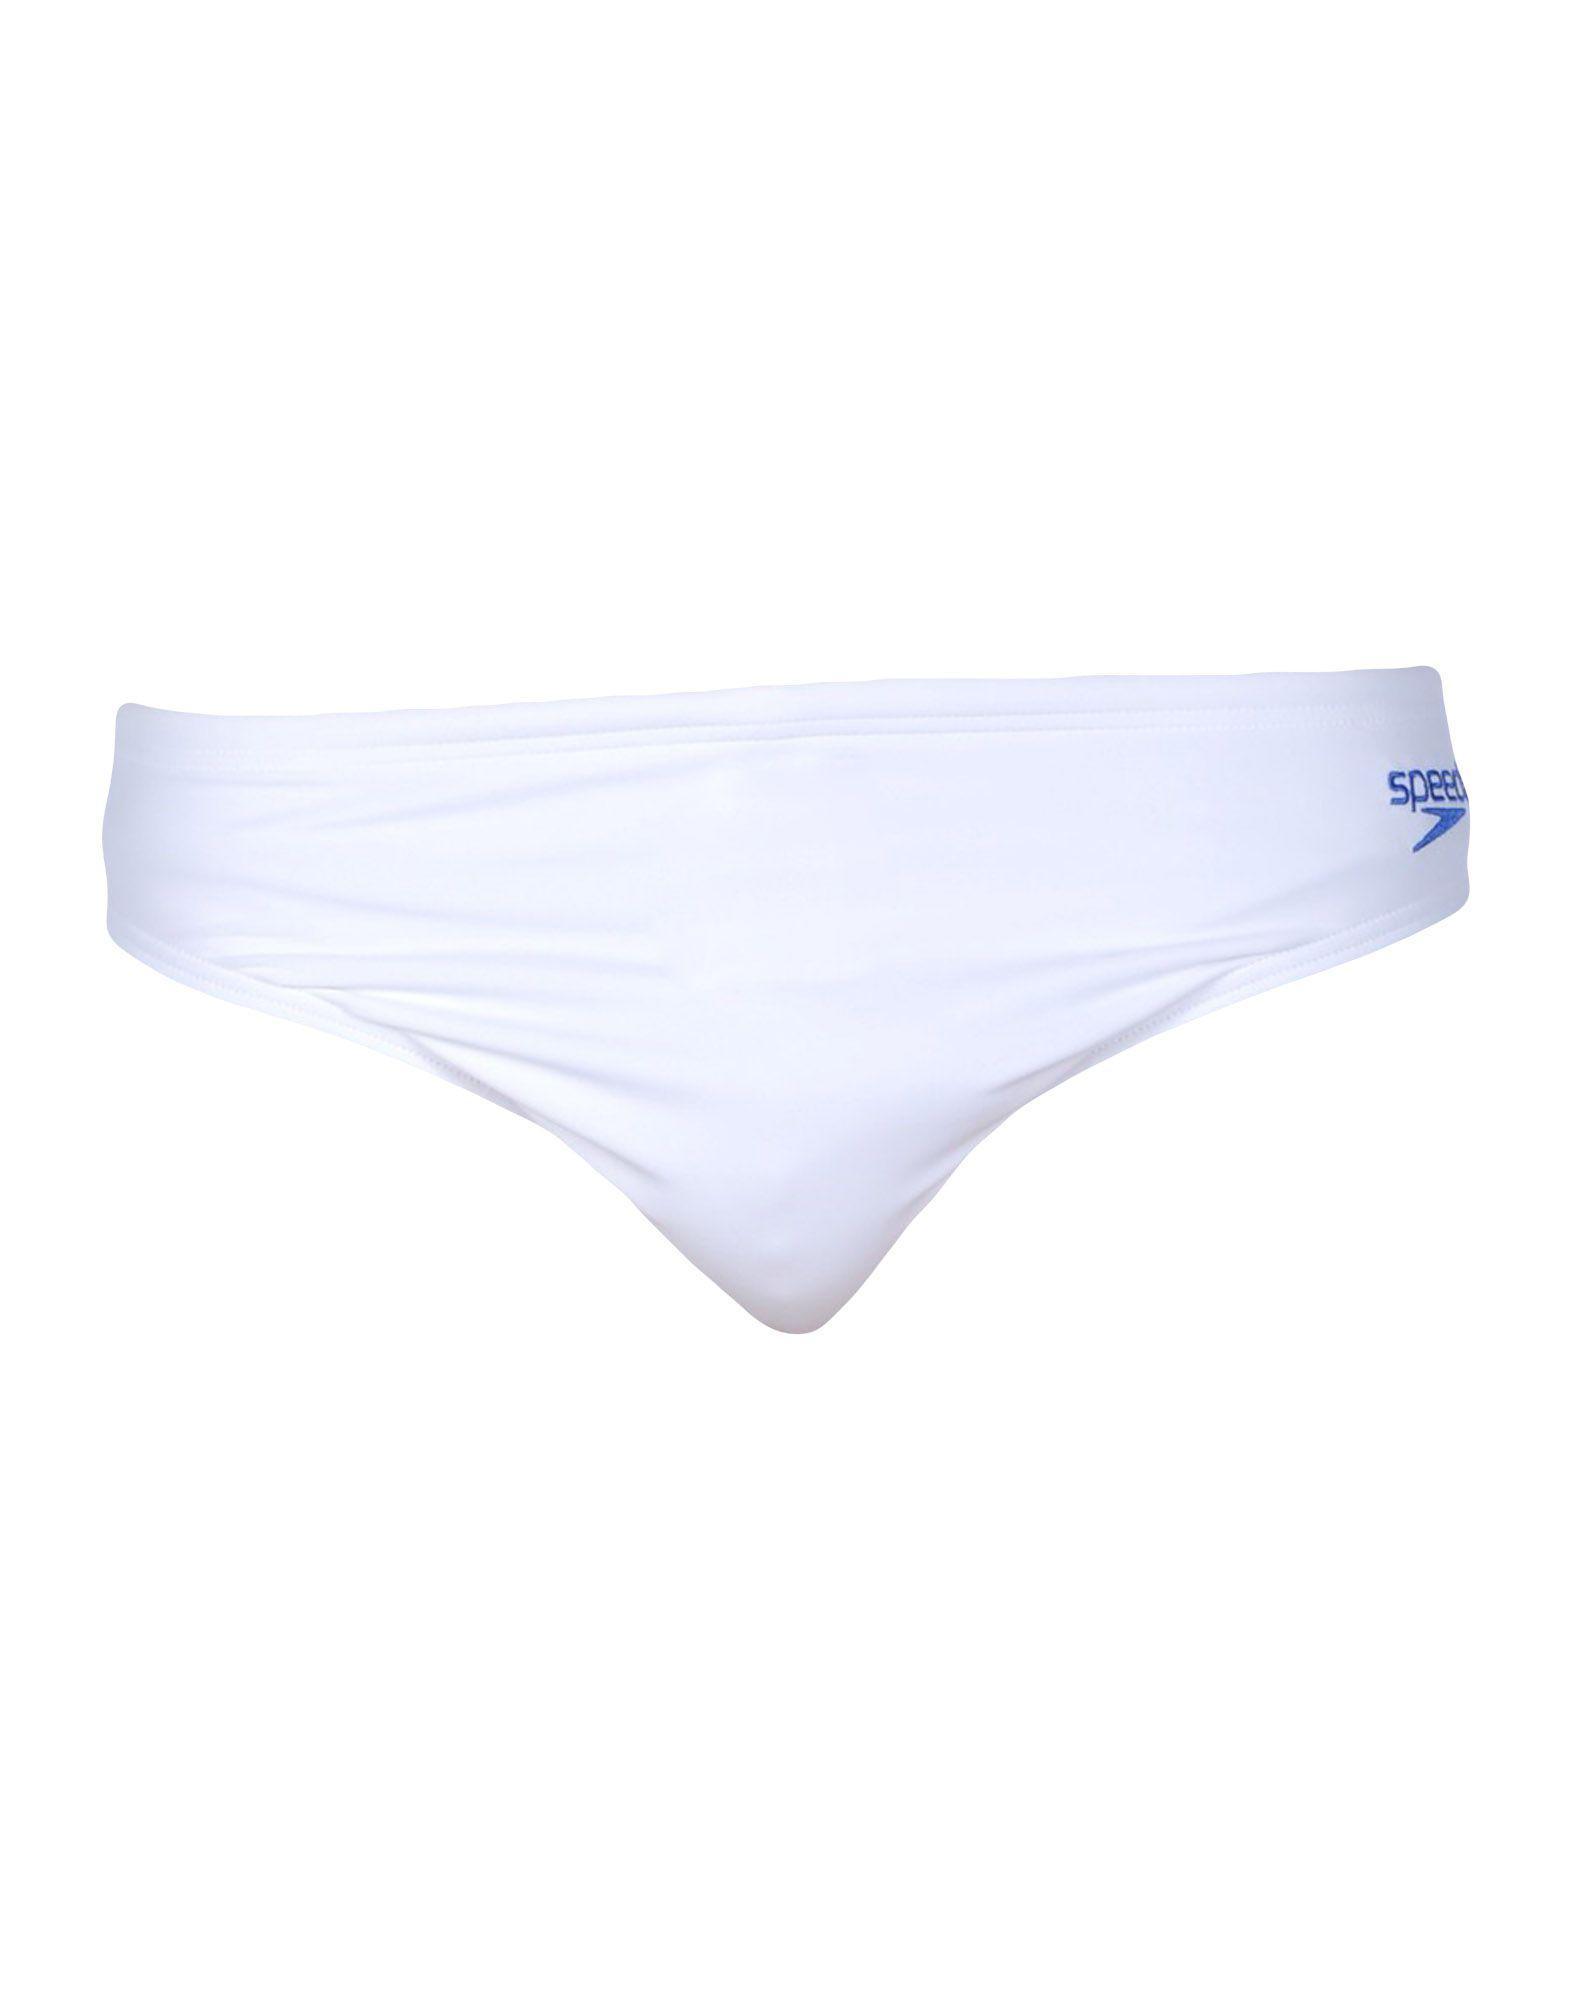 ecc0032540304 Speedo Synthetic Swim Brief in White for Men - Lyst